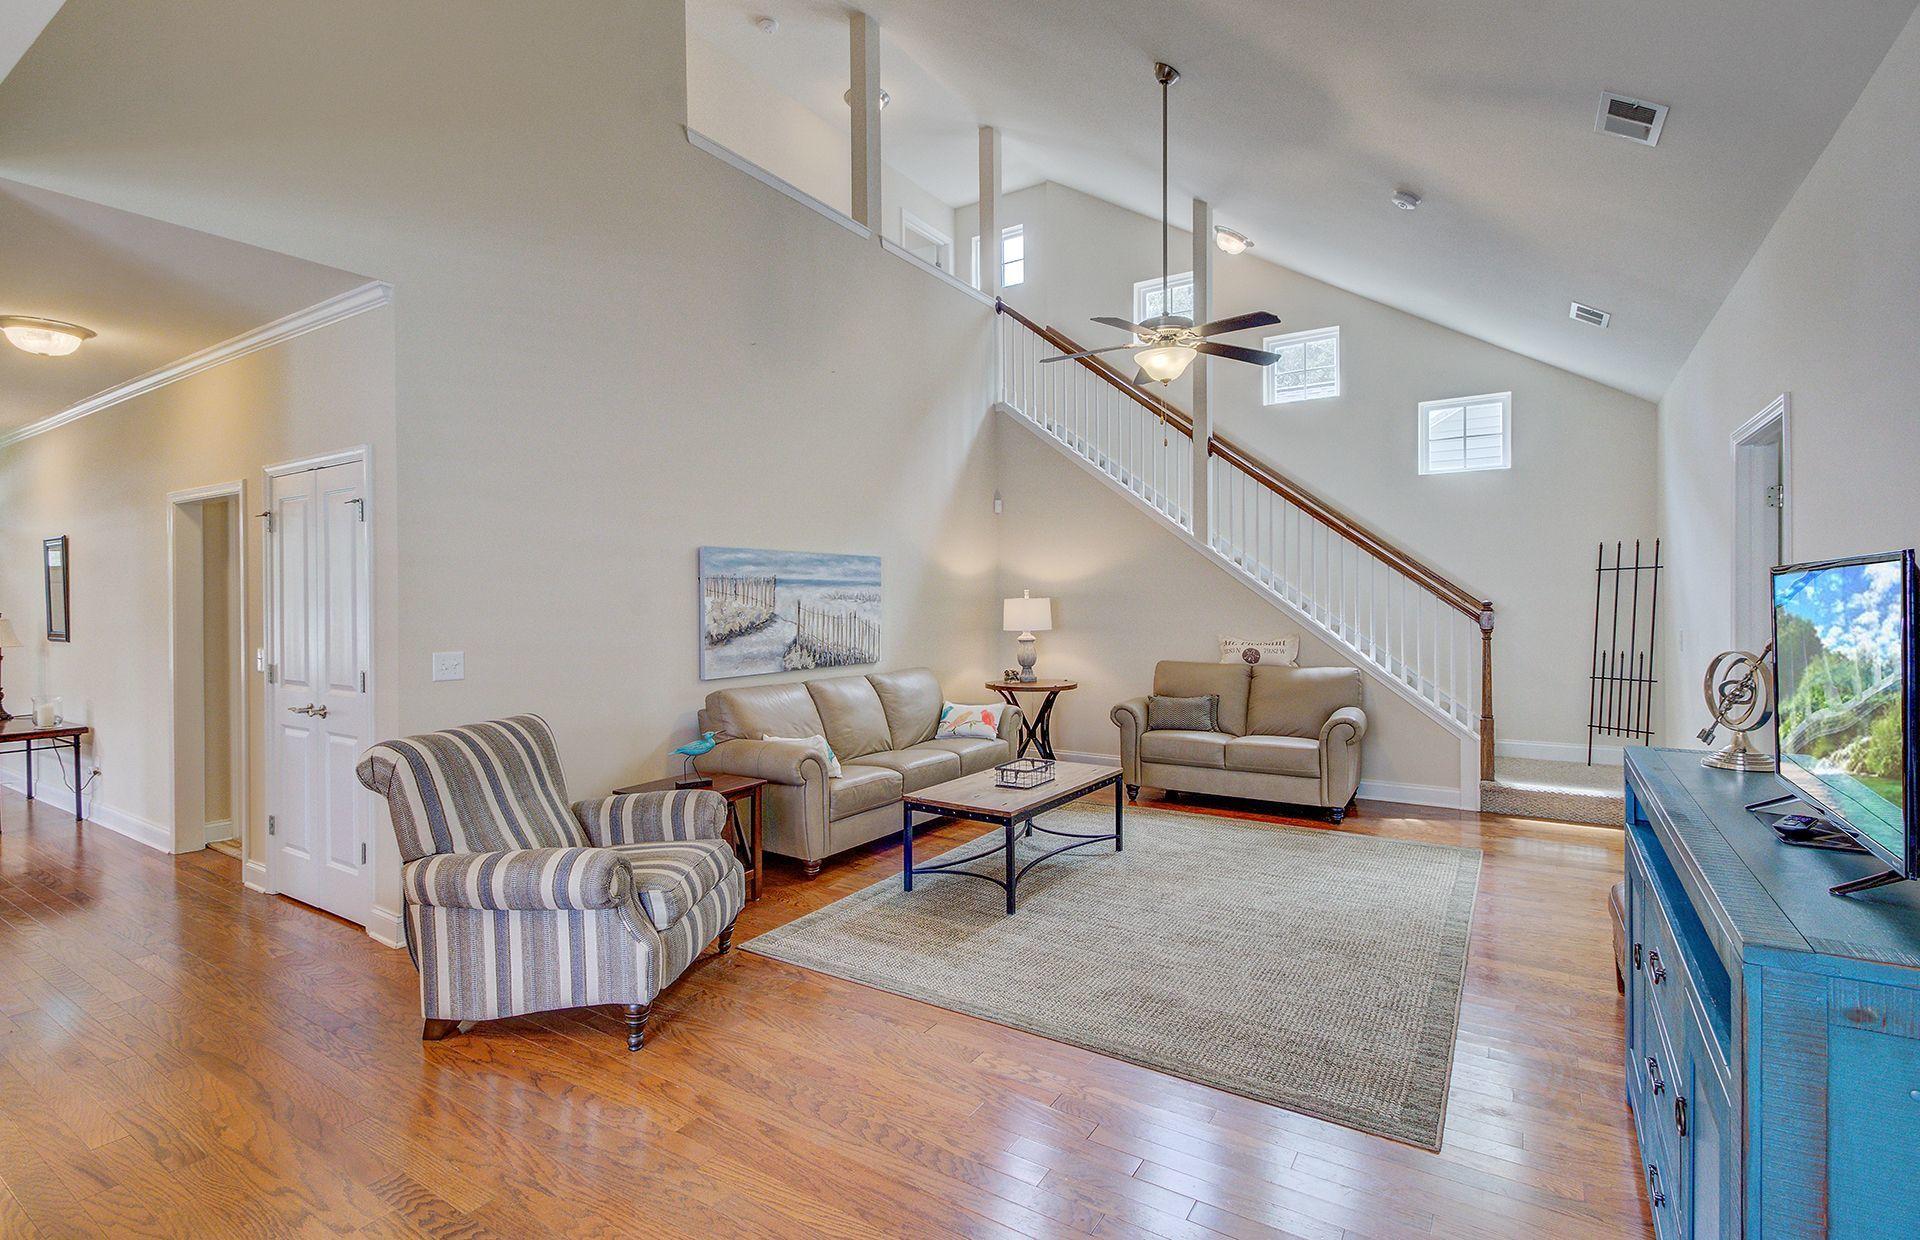 Linnen Place Homes For Sale - 1275 Shingleback, Mount Pleasant, SC - 22